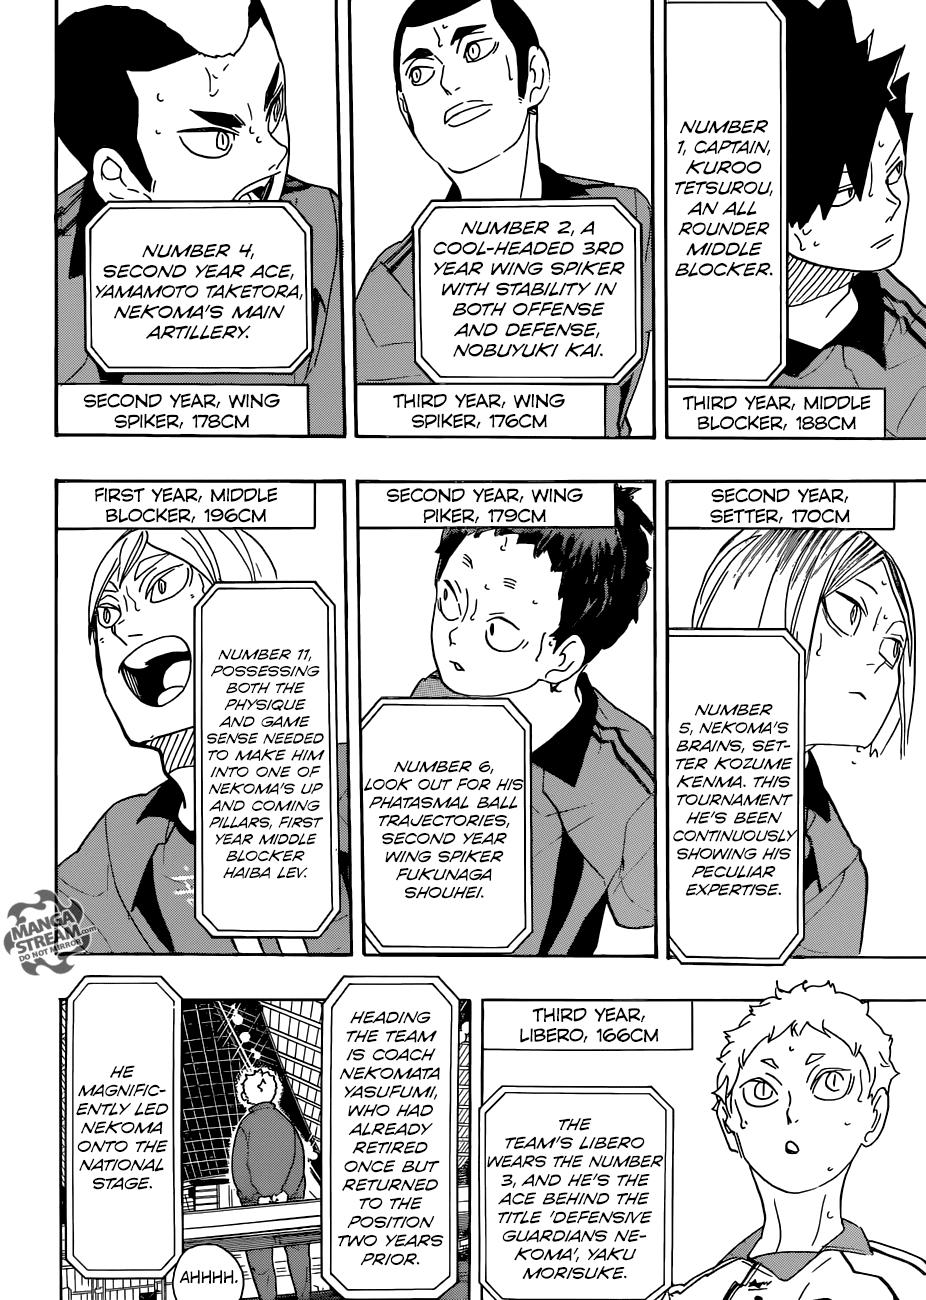 Read Manga Haikyuu 293 The Promised Place Online In High Quality Haikyuu Haikyuu Manga Manga